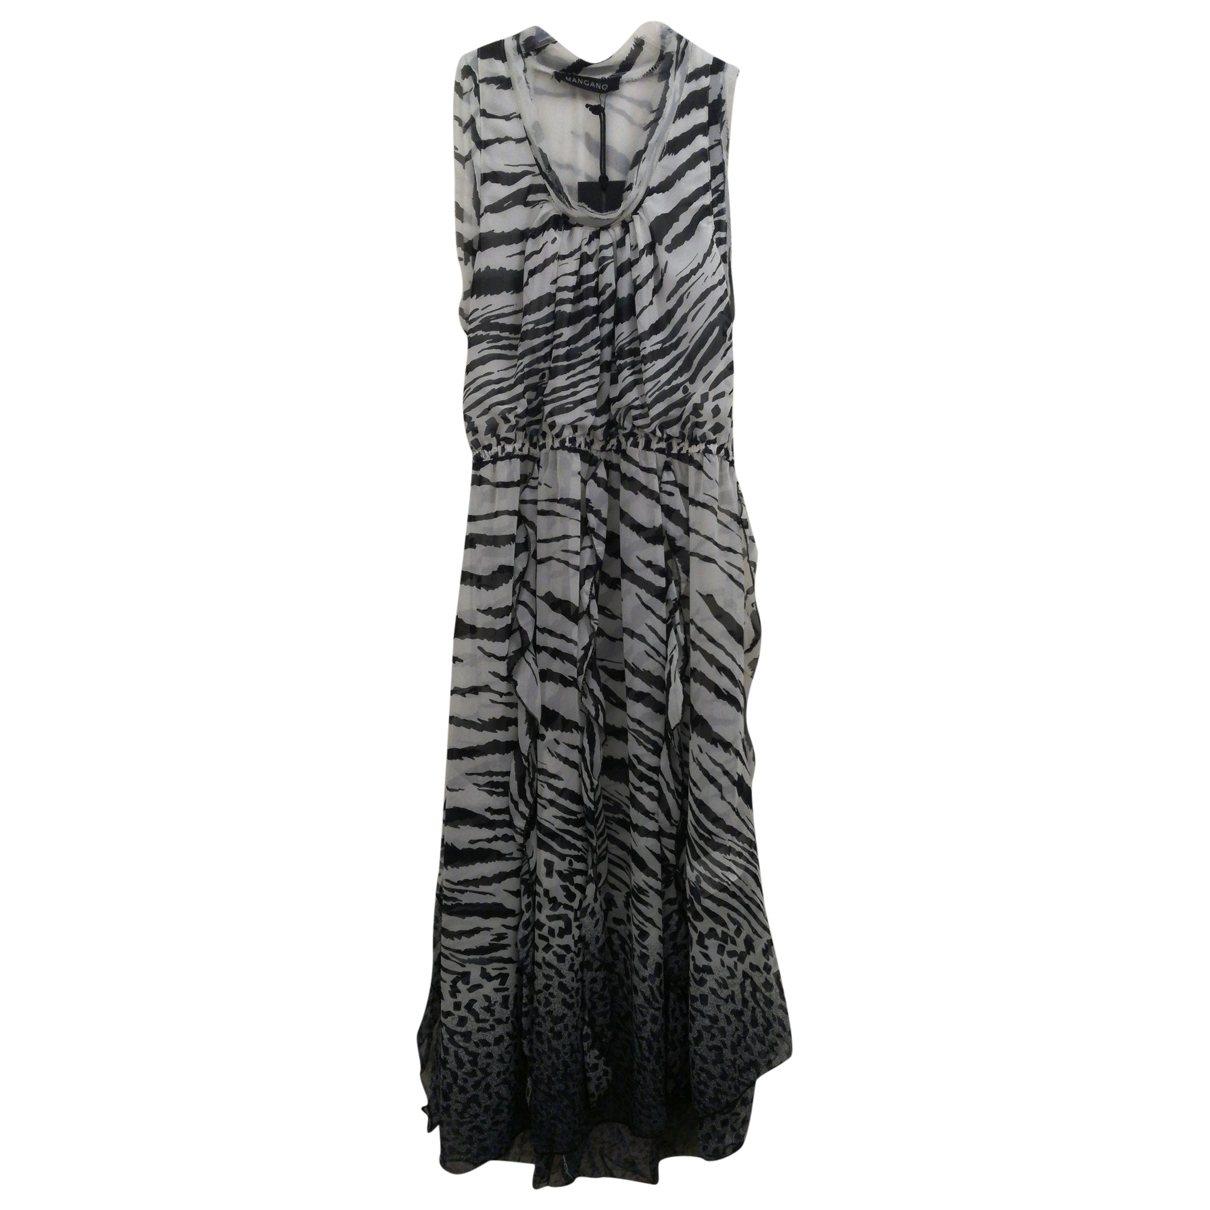 Mangano \N Black dress for Women L International